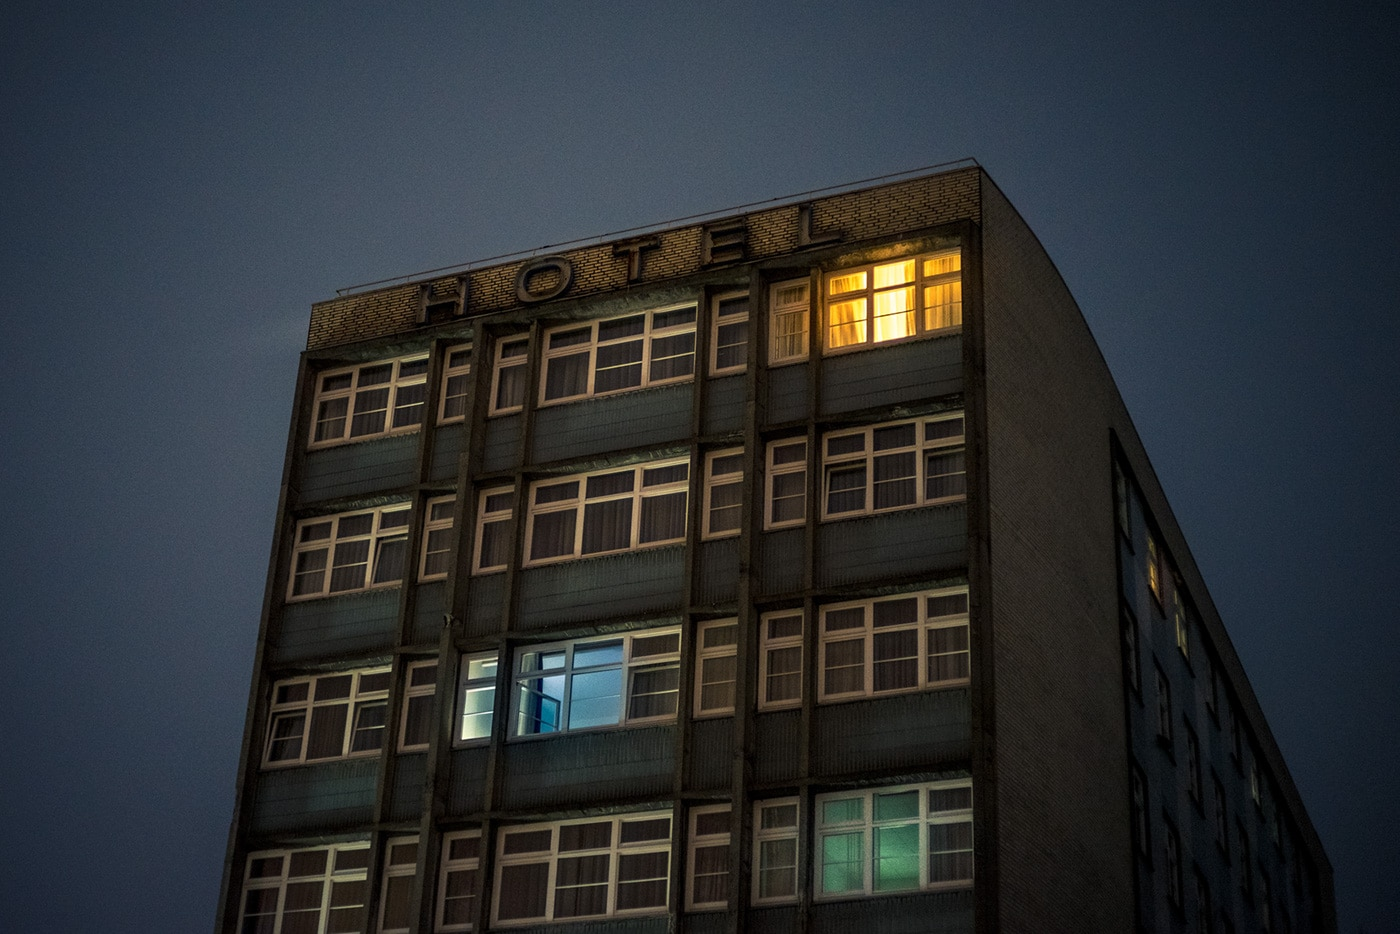 Mark Broyer Hamburg photographs